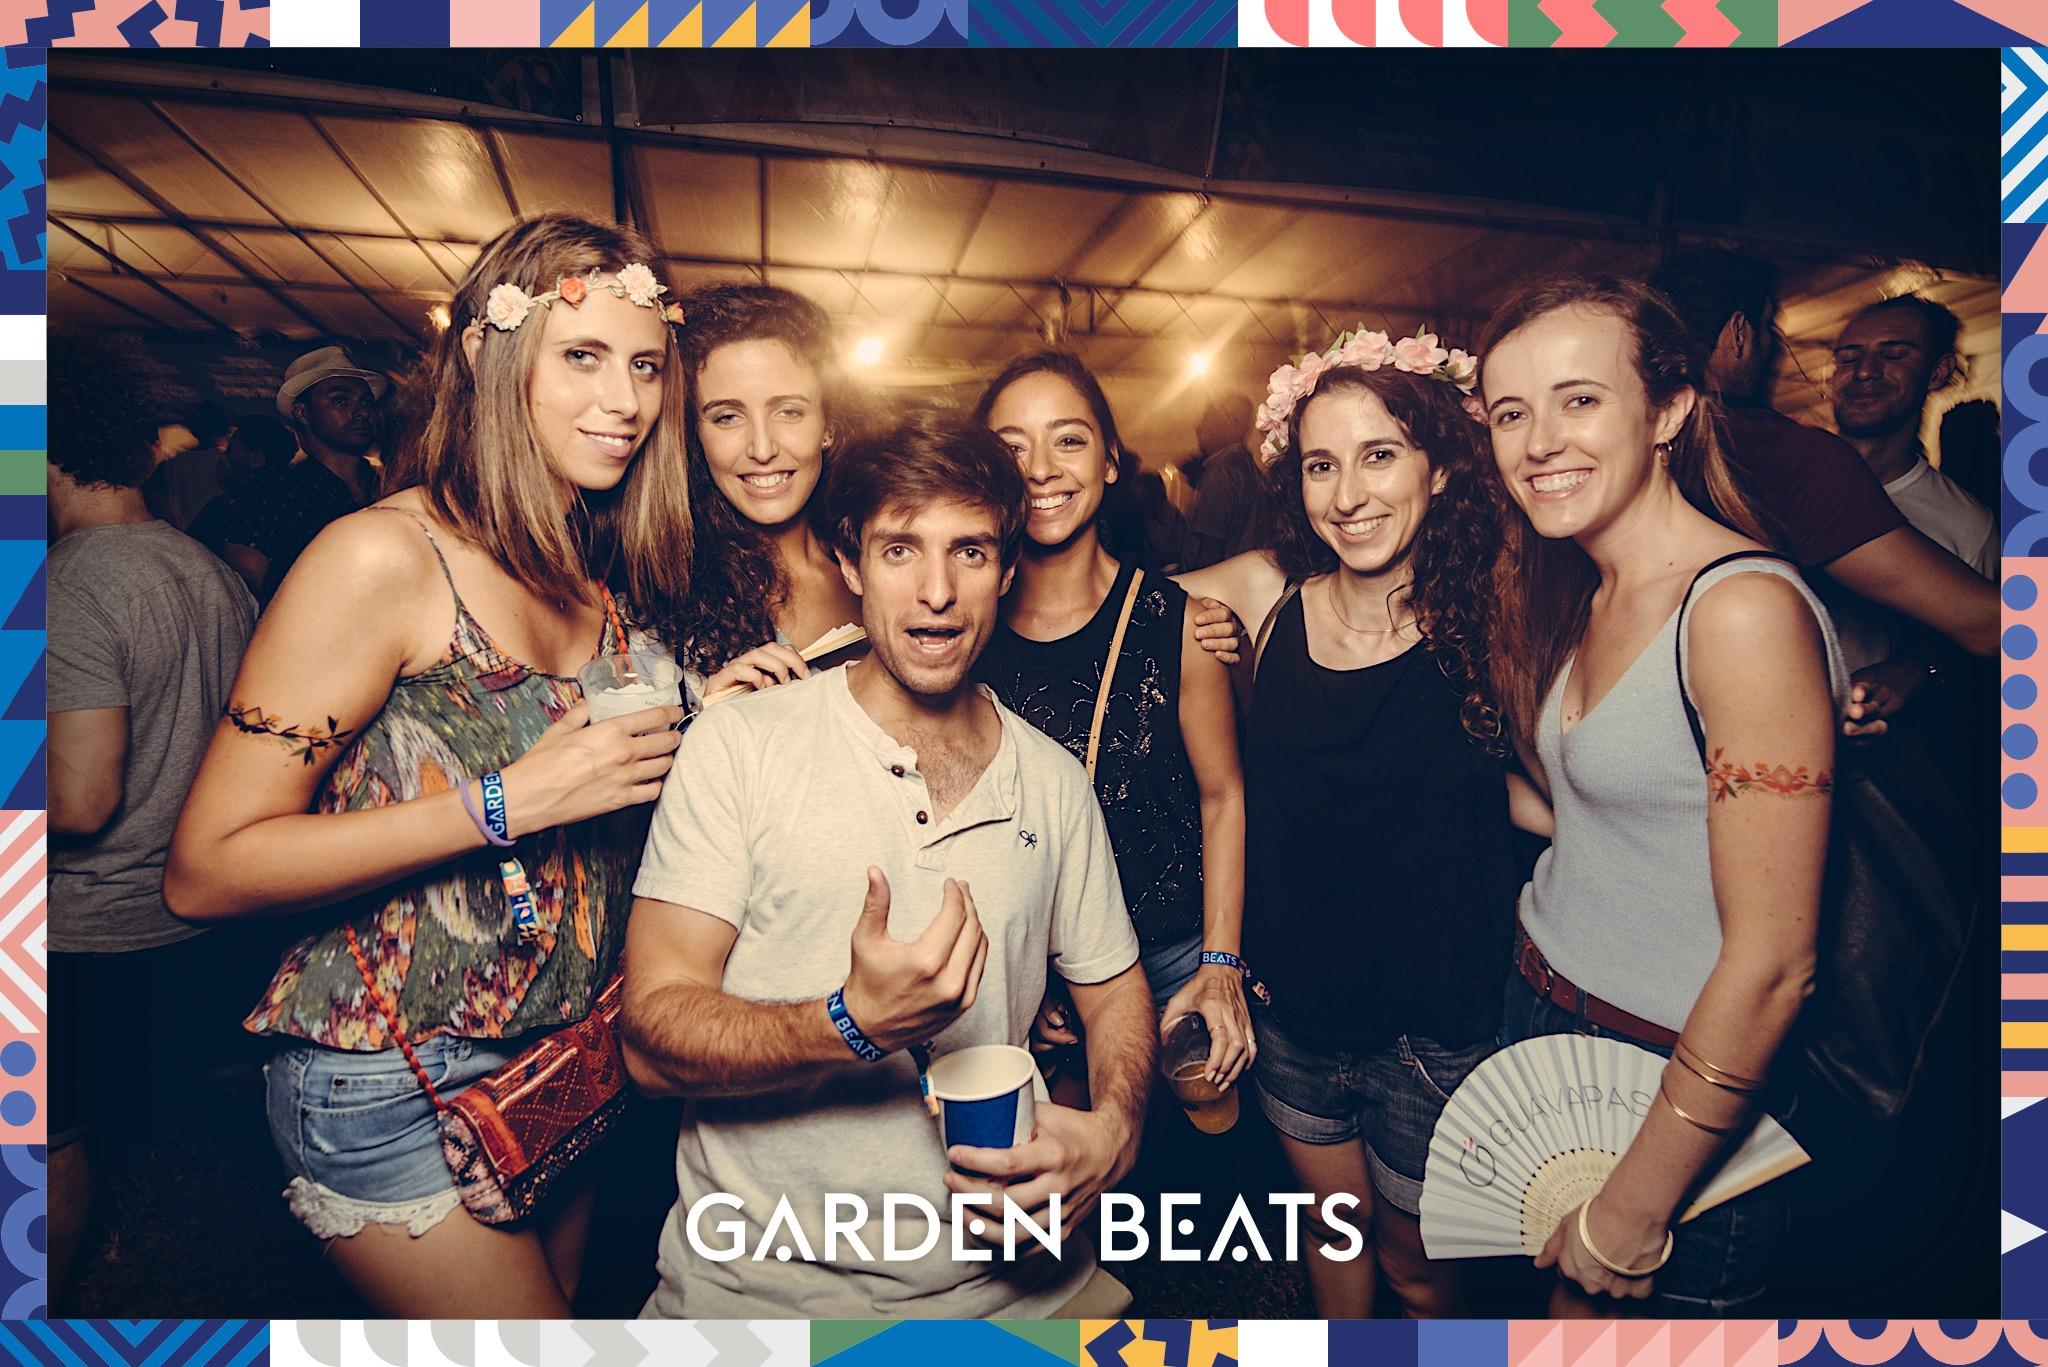 18032017_GardenBeats_Colossal750_WatermarkedGB.jpg